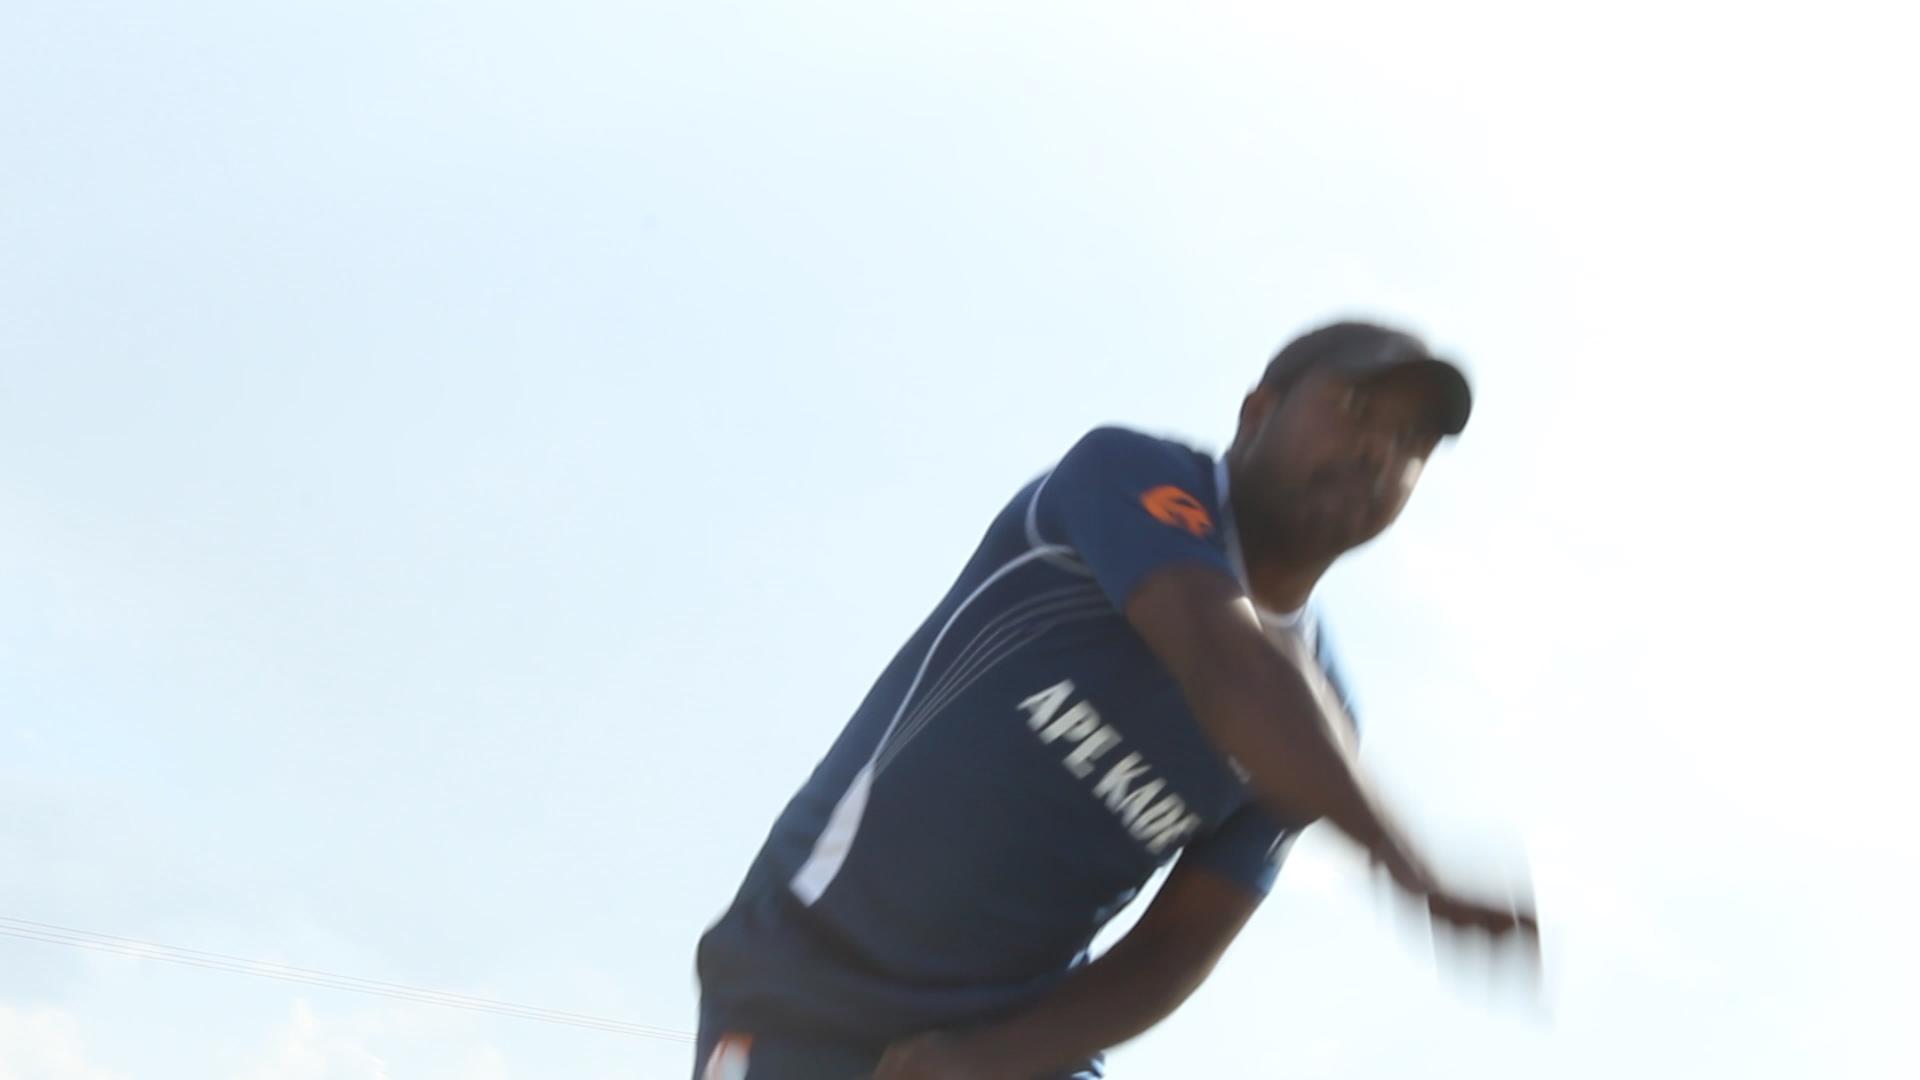 training-cricket-championship-rushes-01_12_09_05-still044